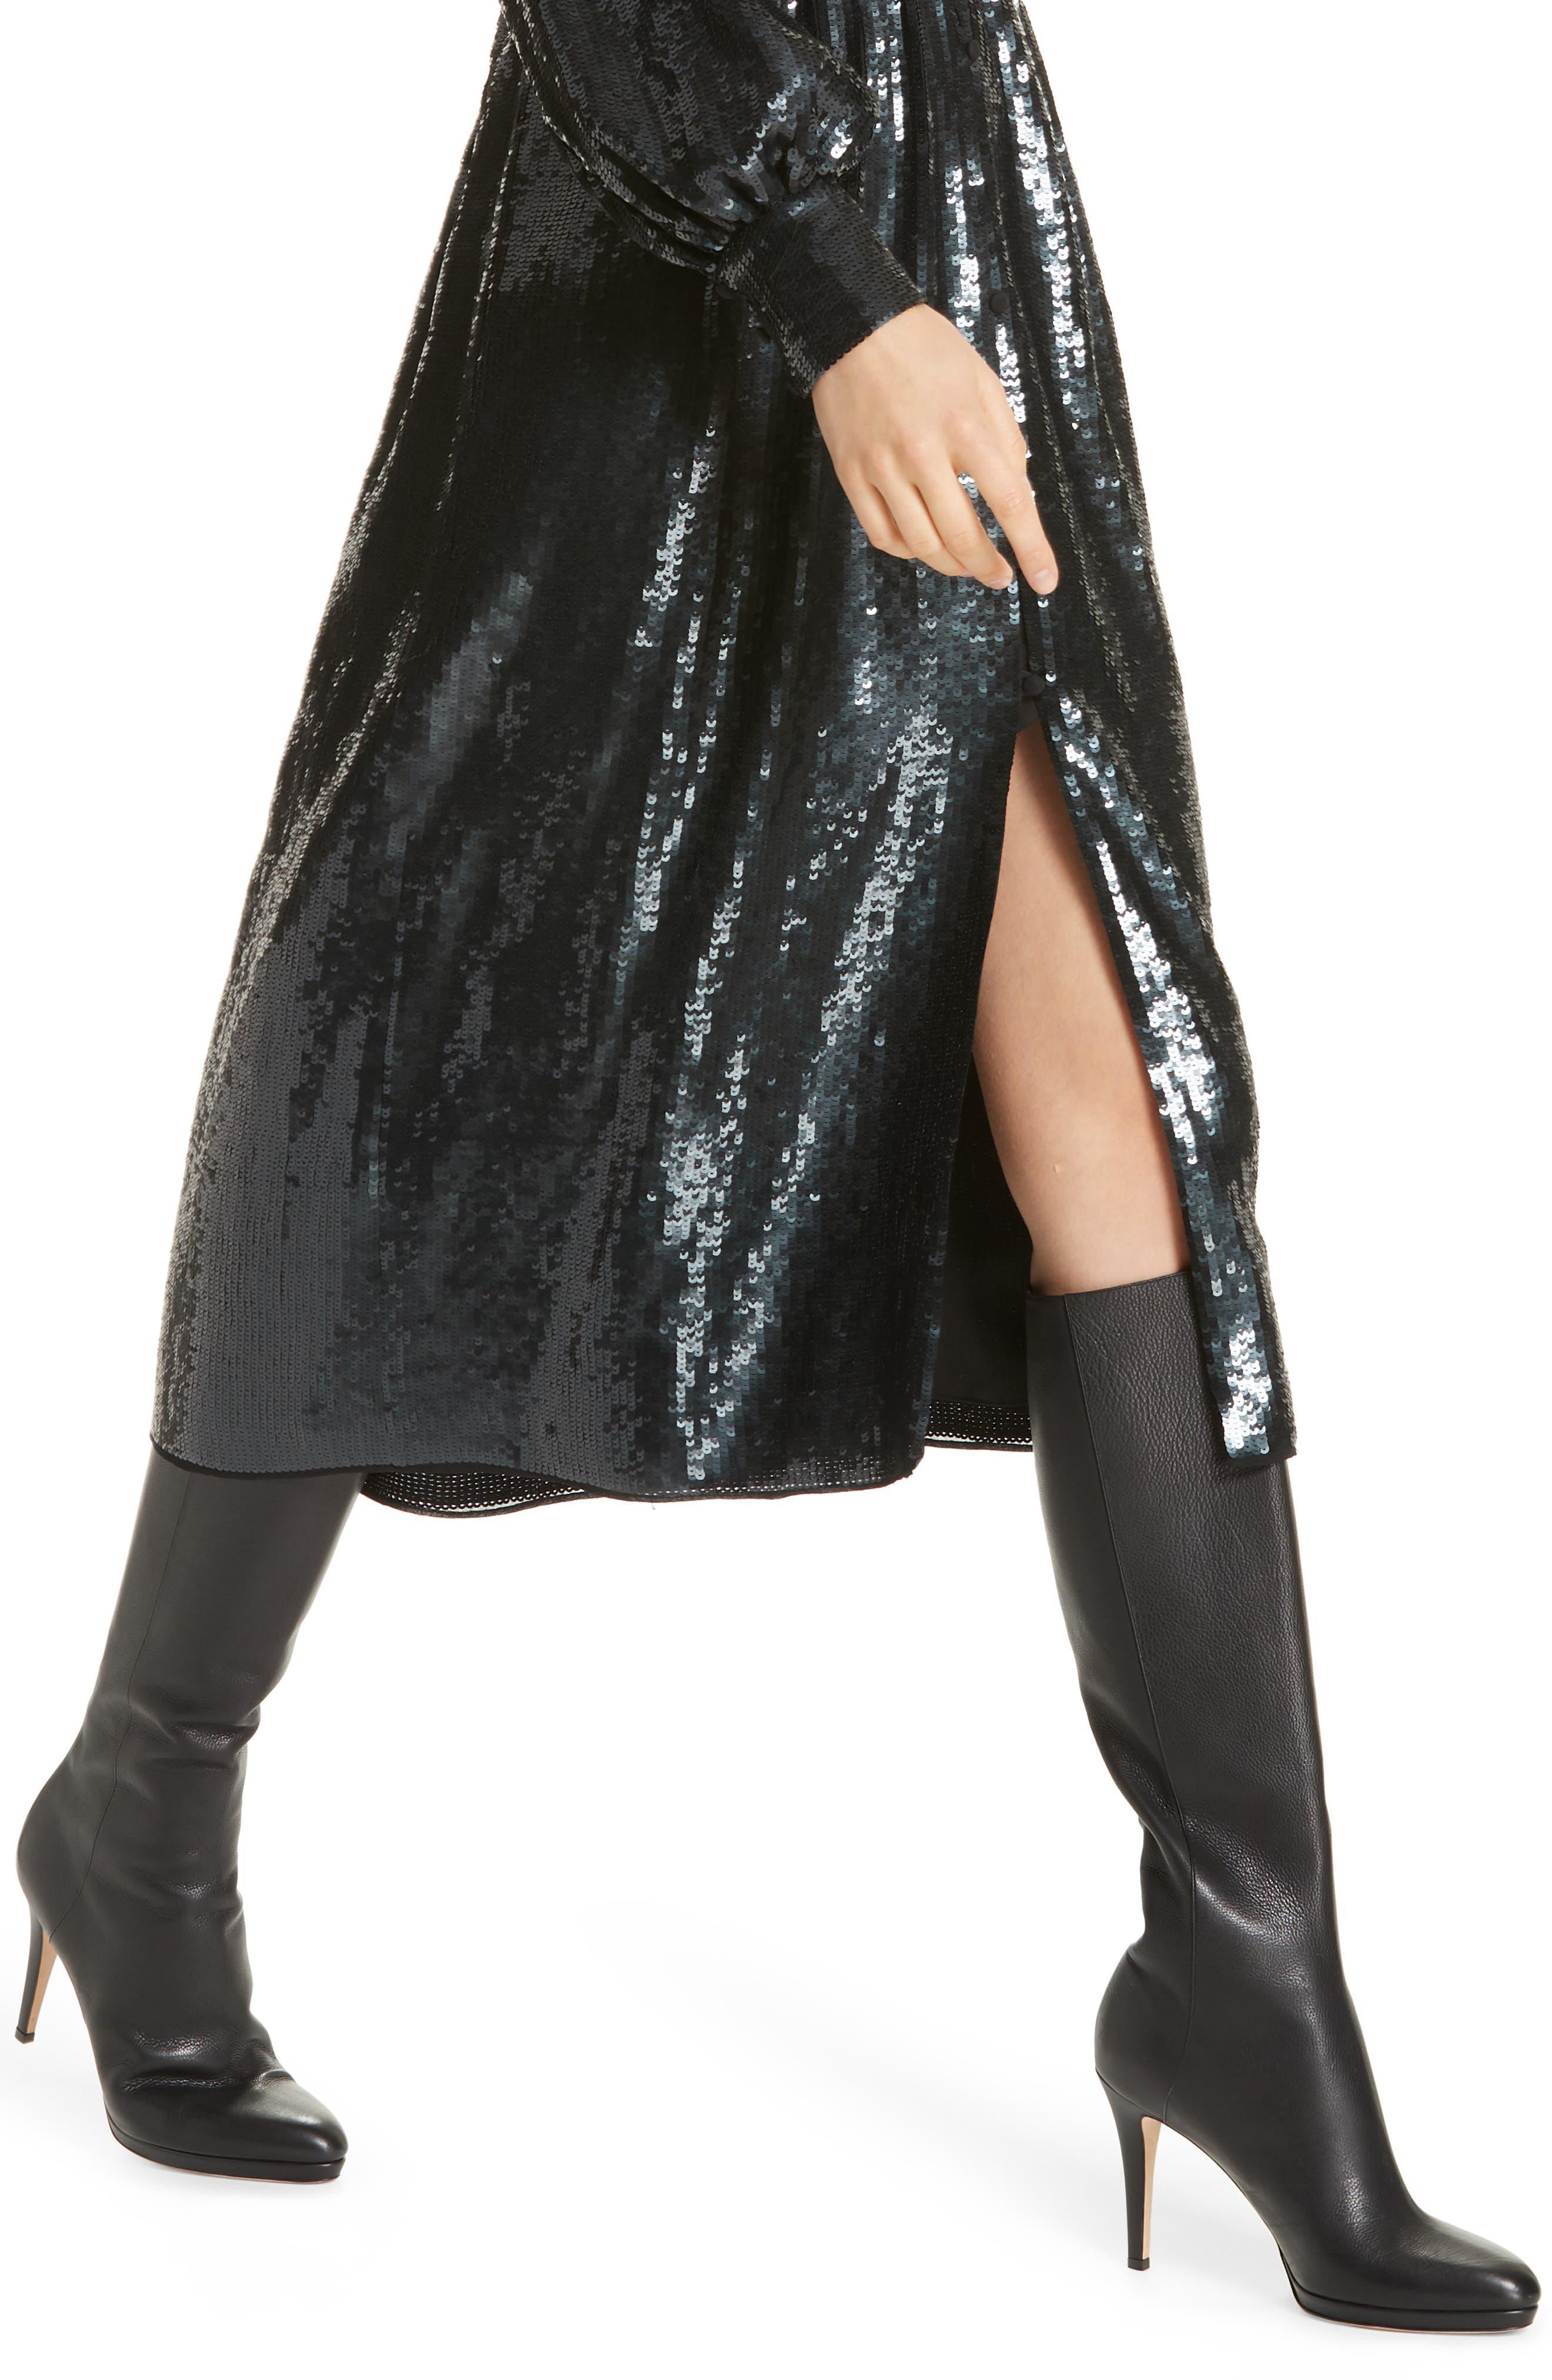 Kyria B Sequin Midi Dress,                             Alternate thumbnail 4, color,                             001